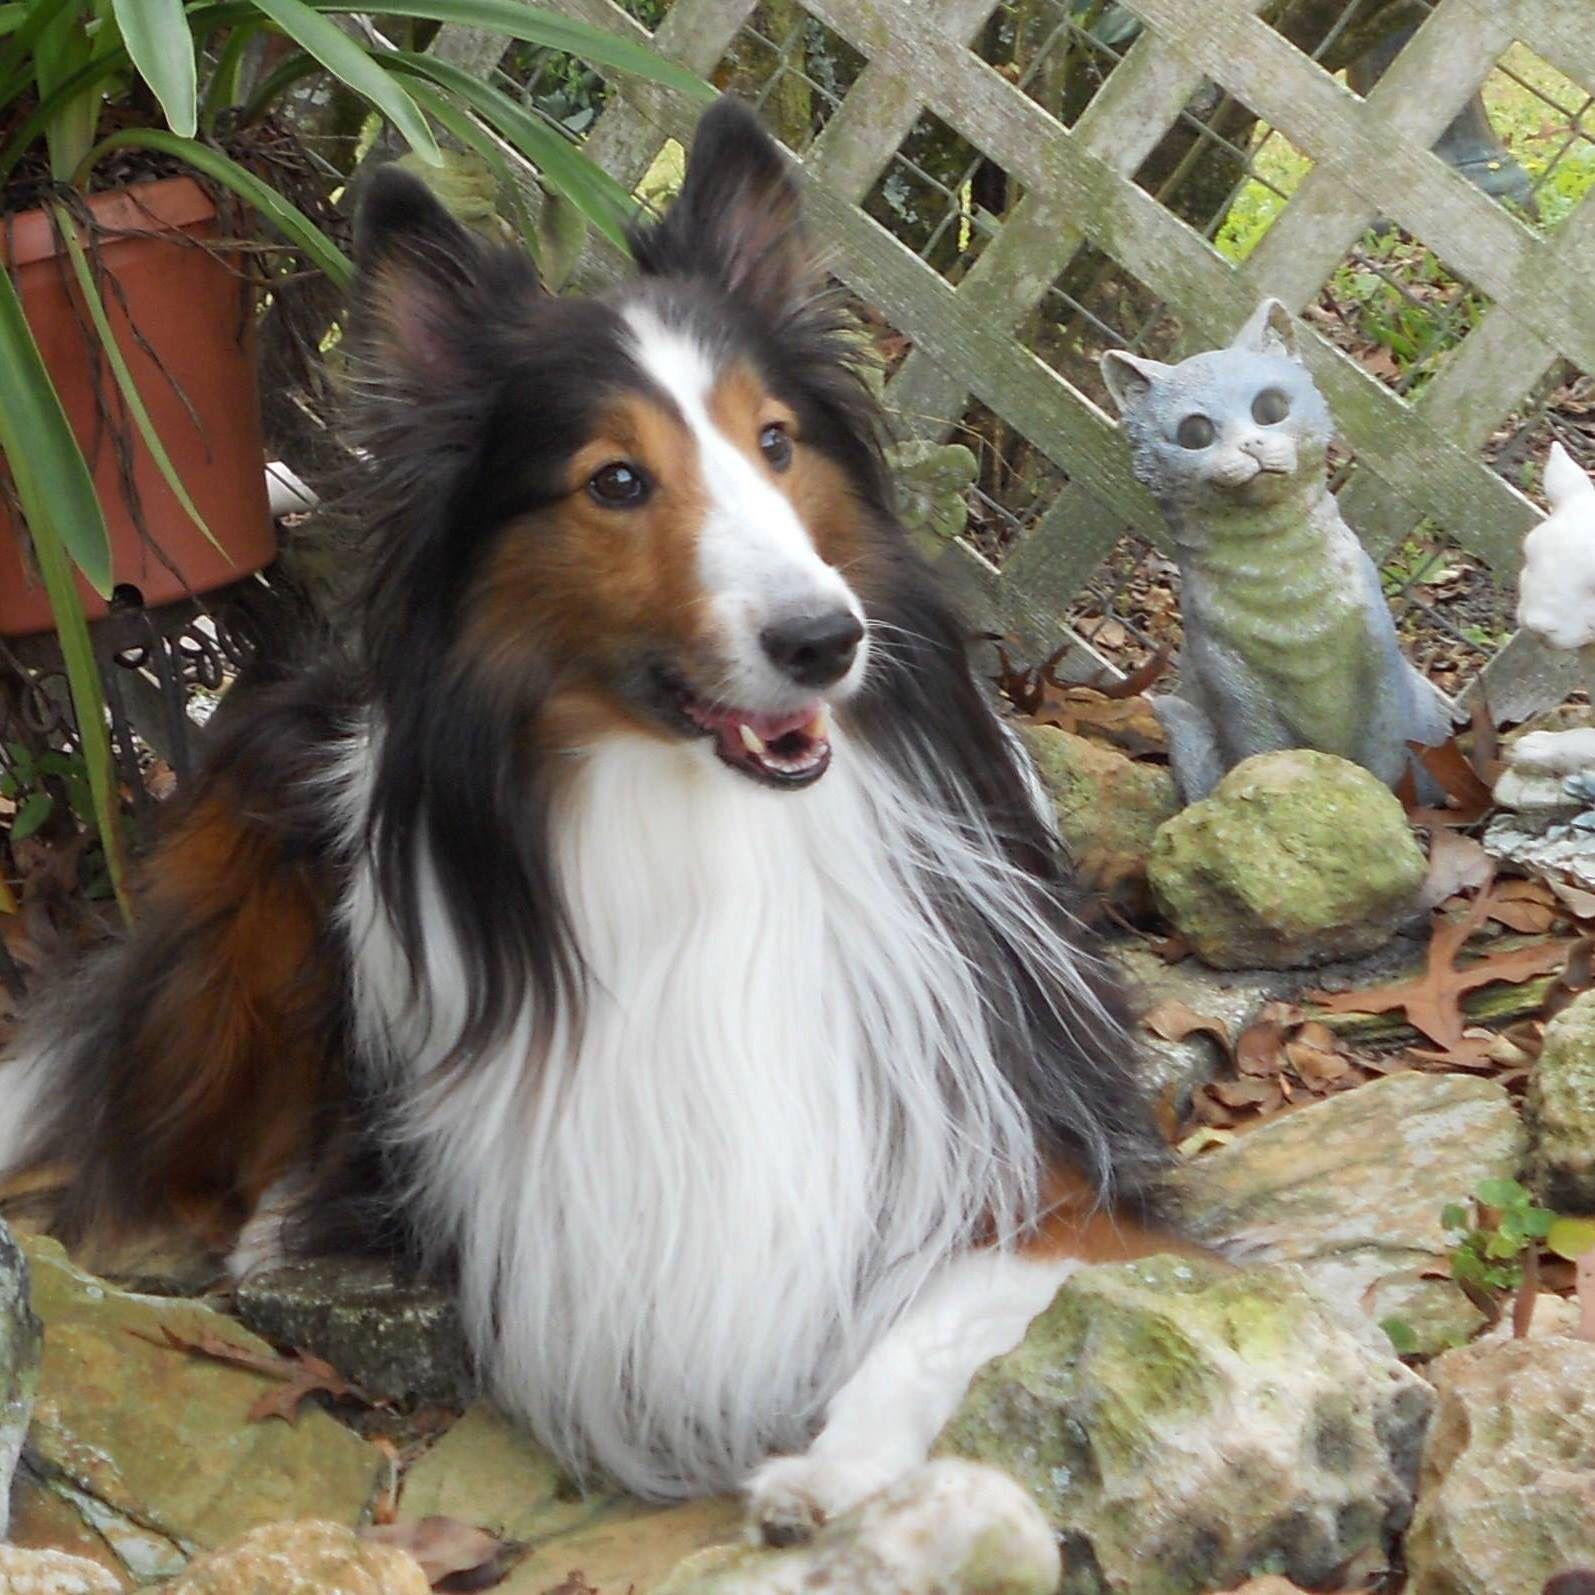 Sheltie in the garden